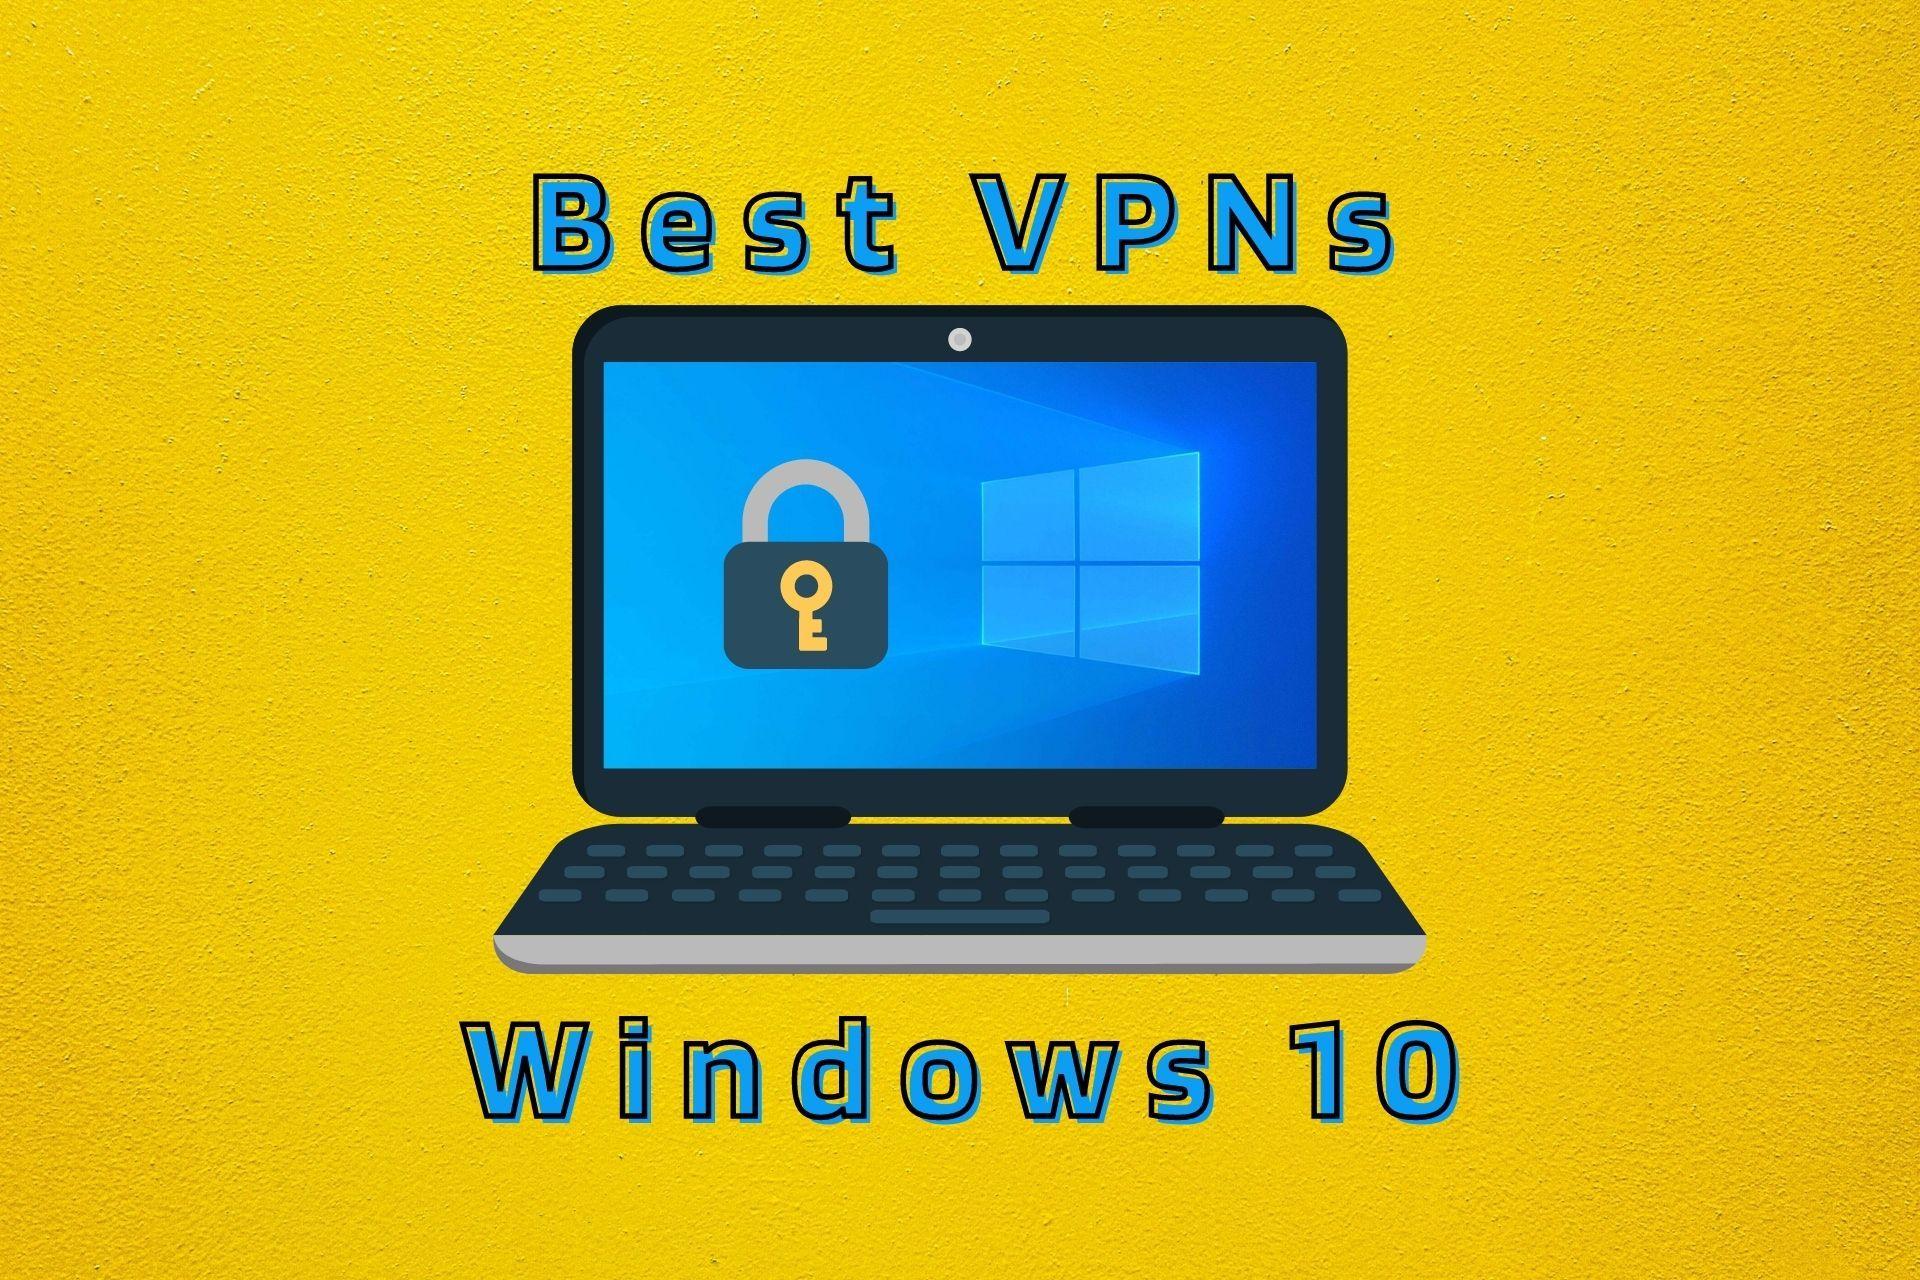 e4702e07246be81e0c07f518589f47ba - Best Vpn Client For Windows 10